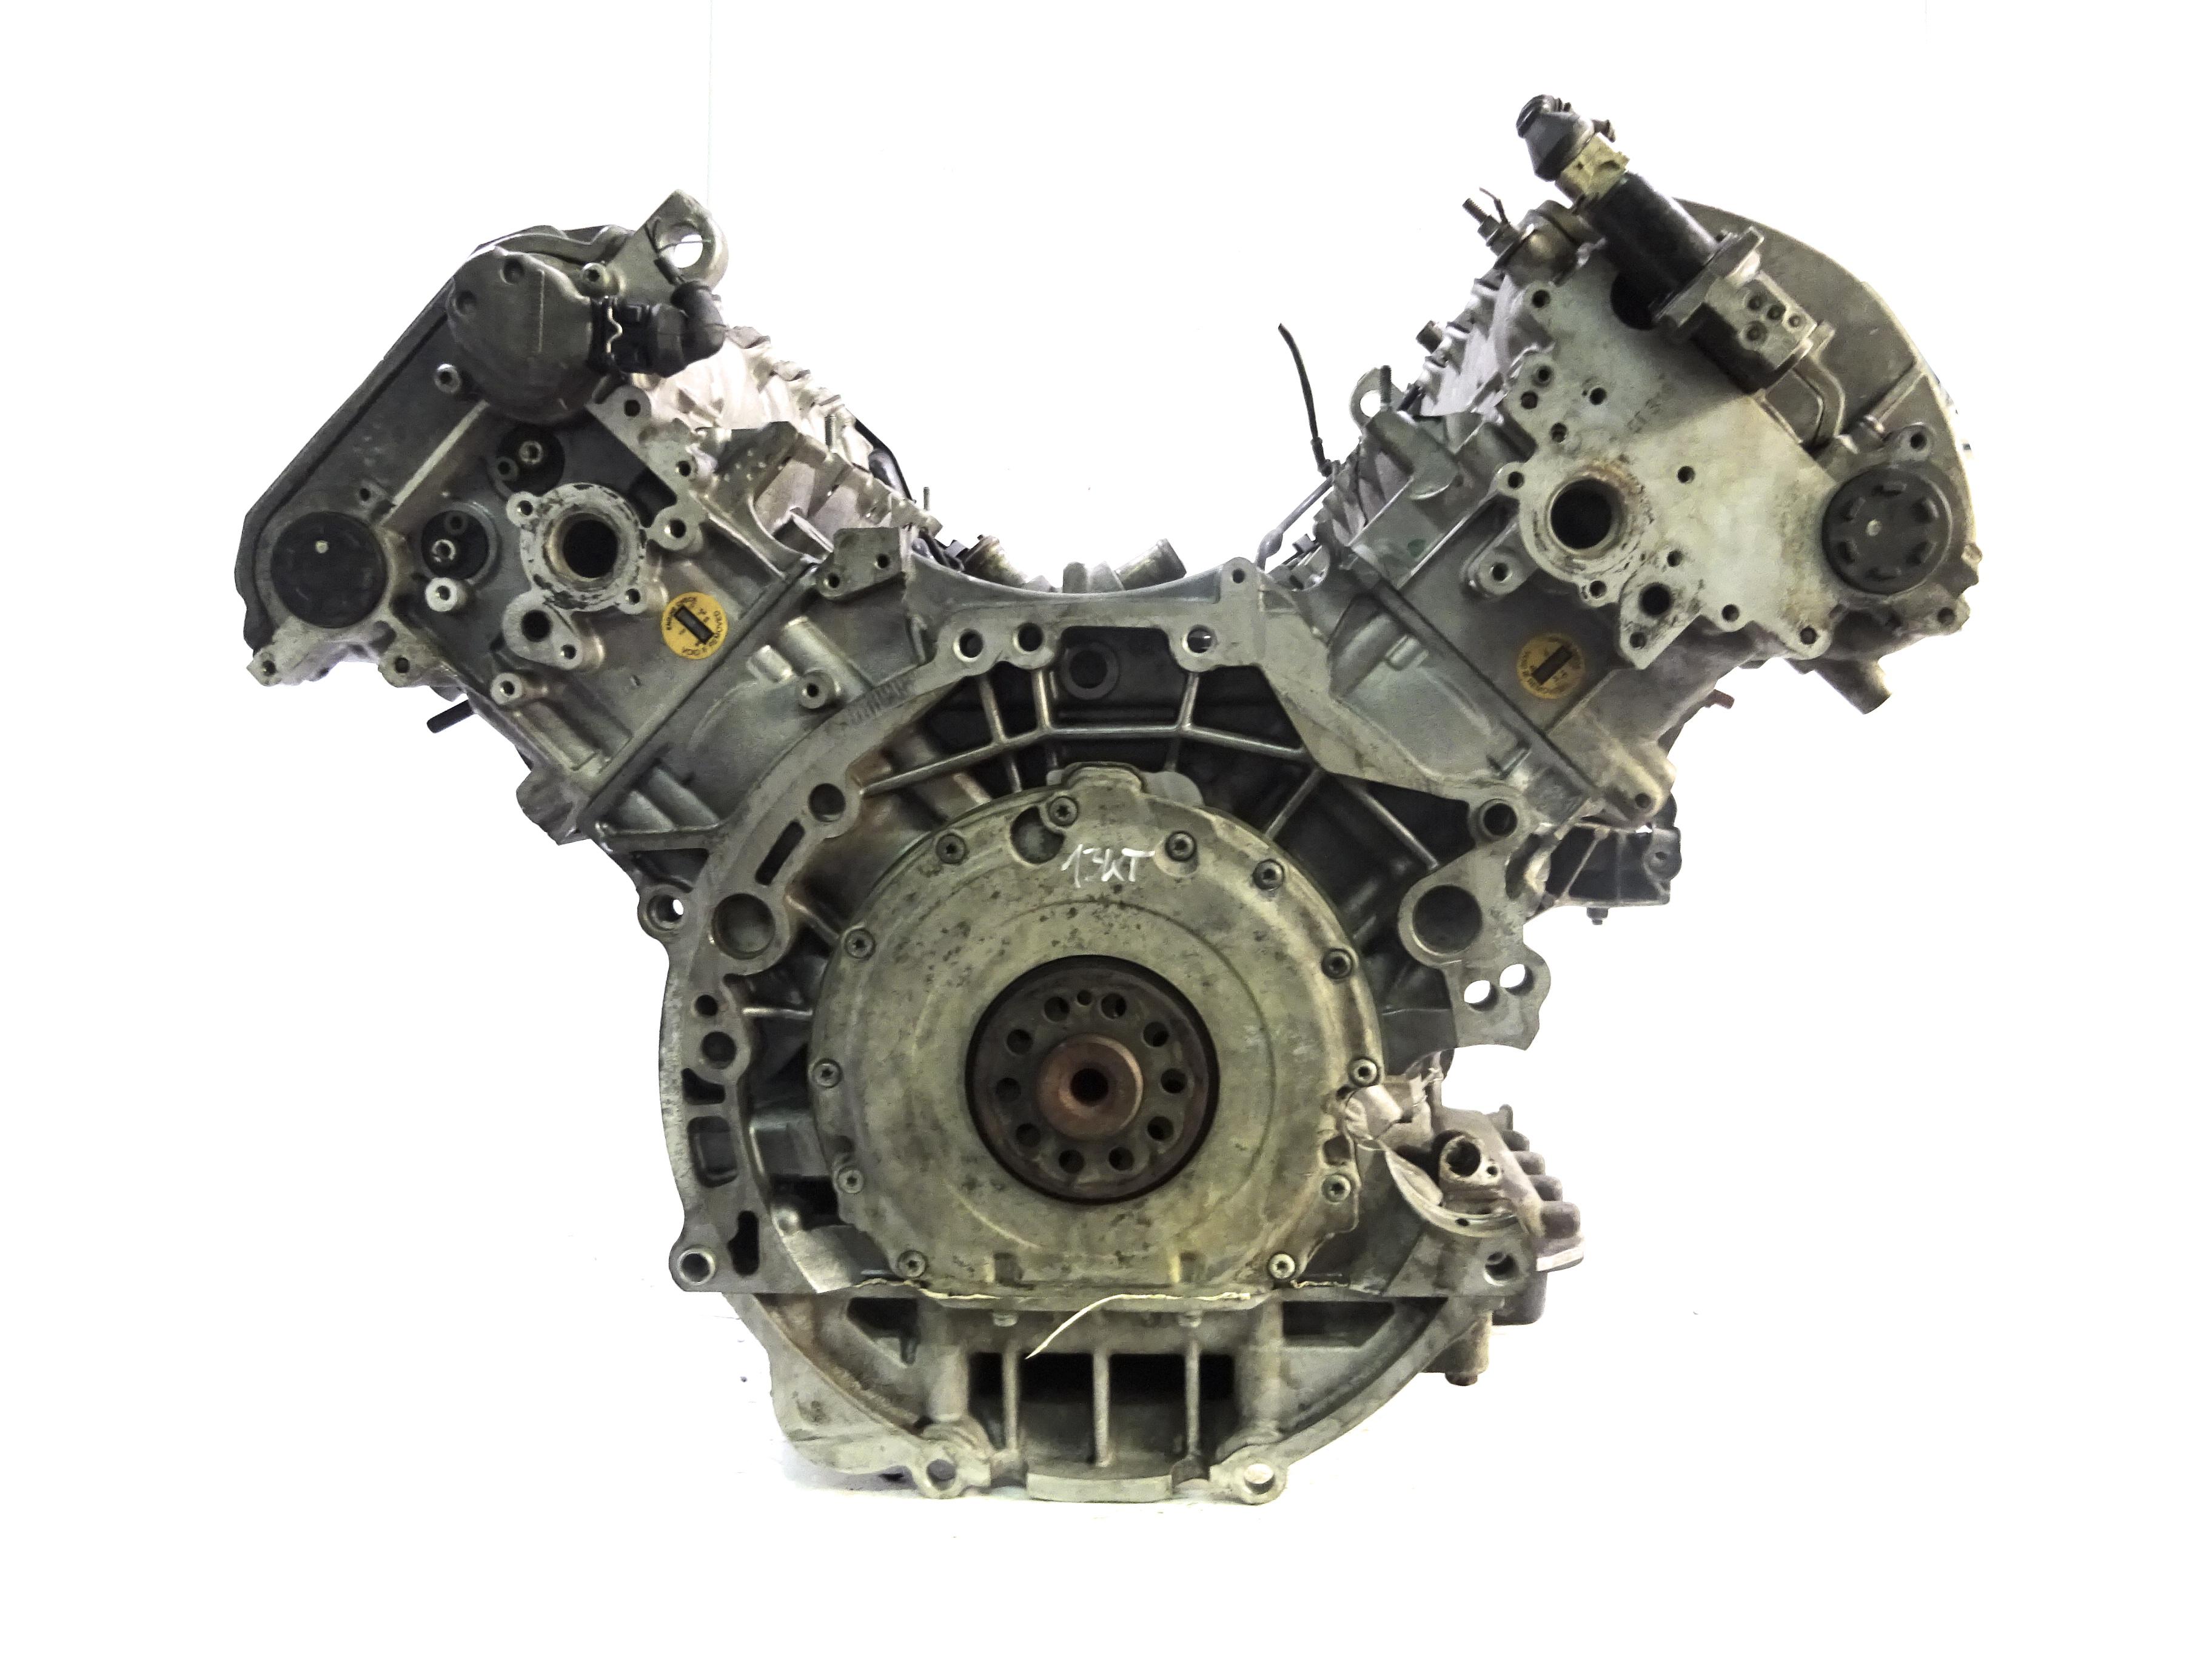 Motor 2003 für Audi A6 C5 RS6 4,2 Quattro Benzin BCY 450 PS